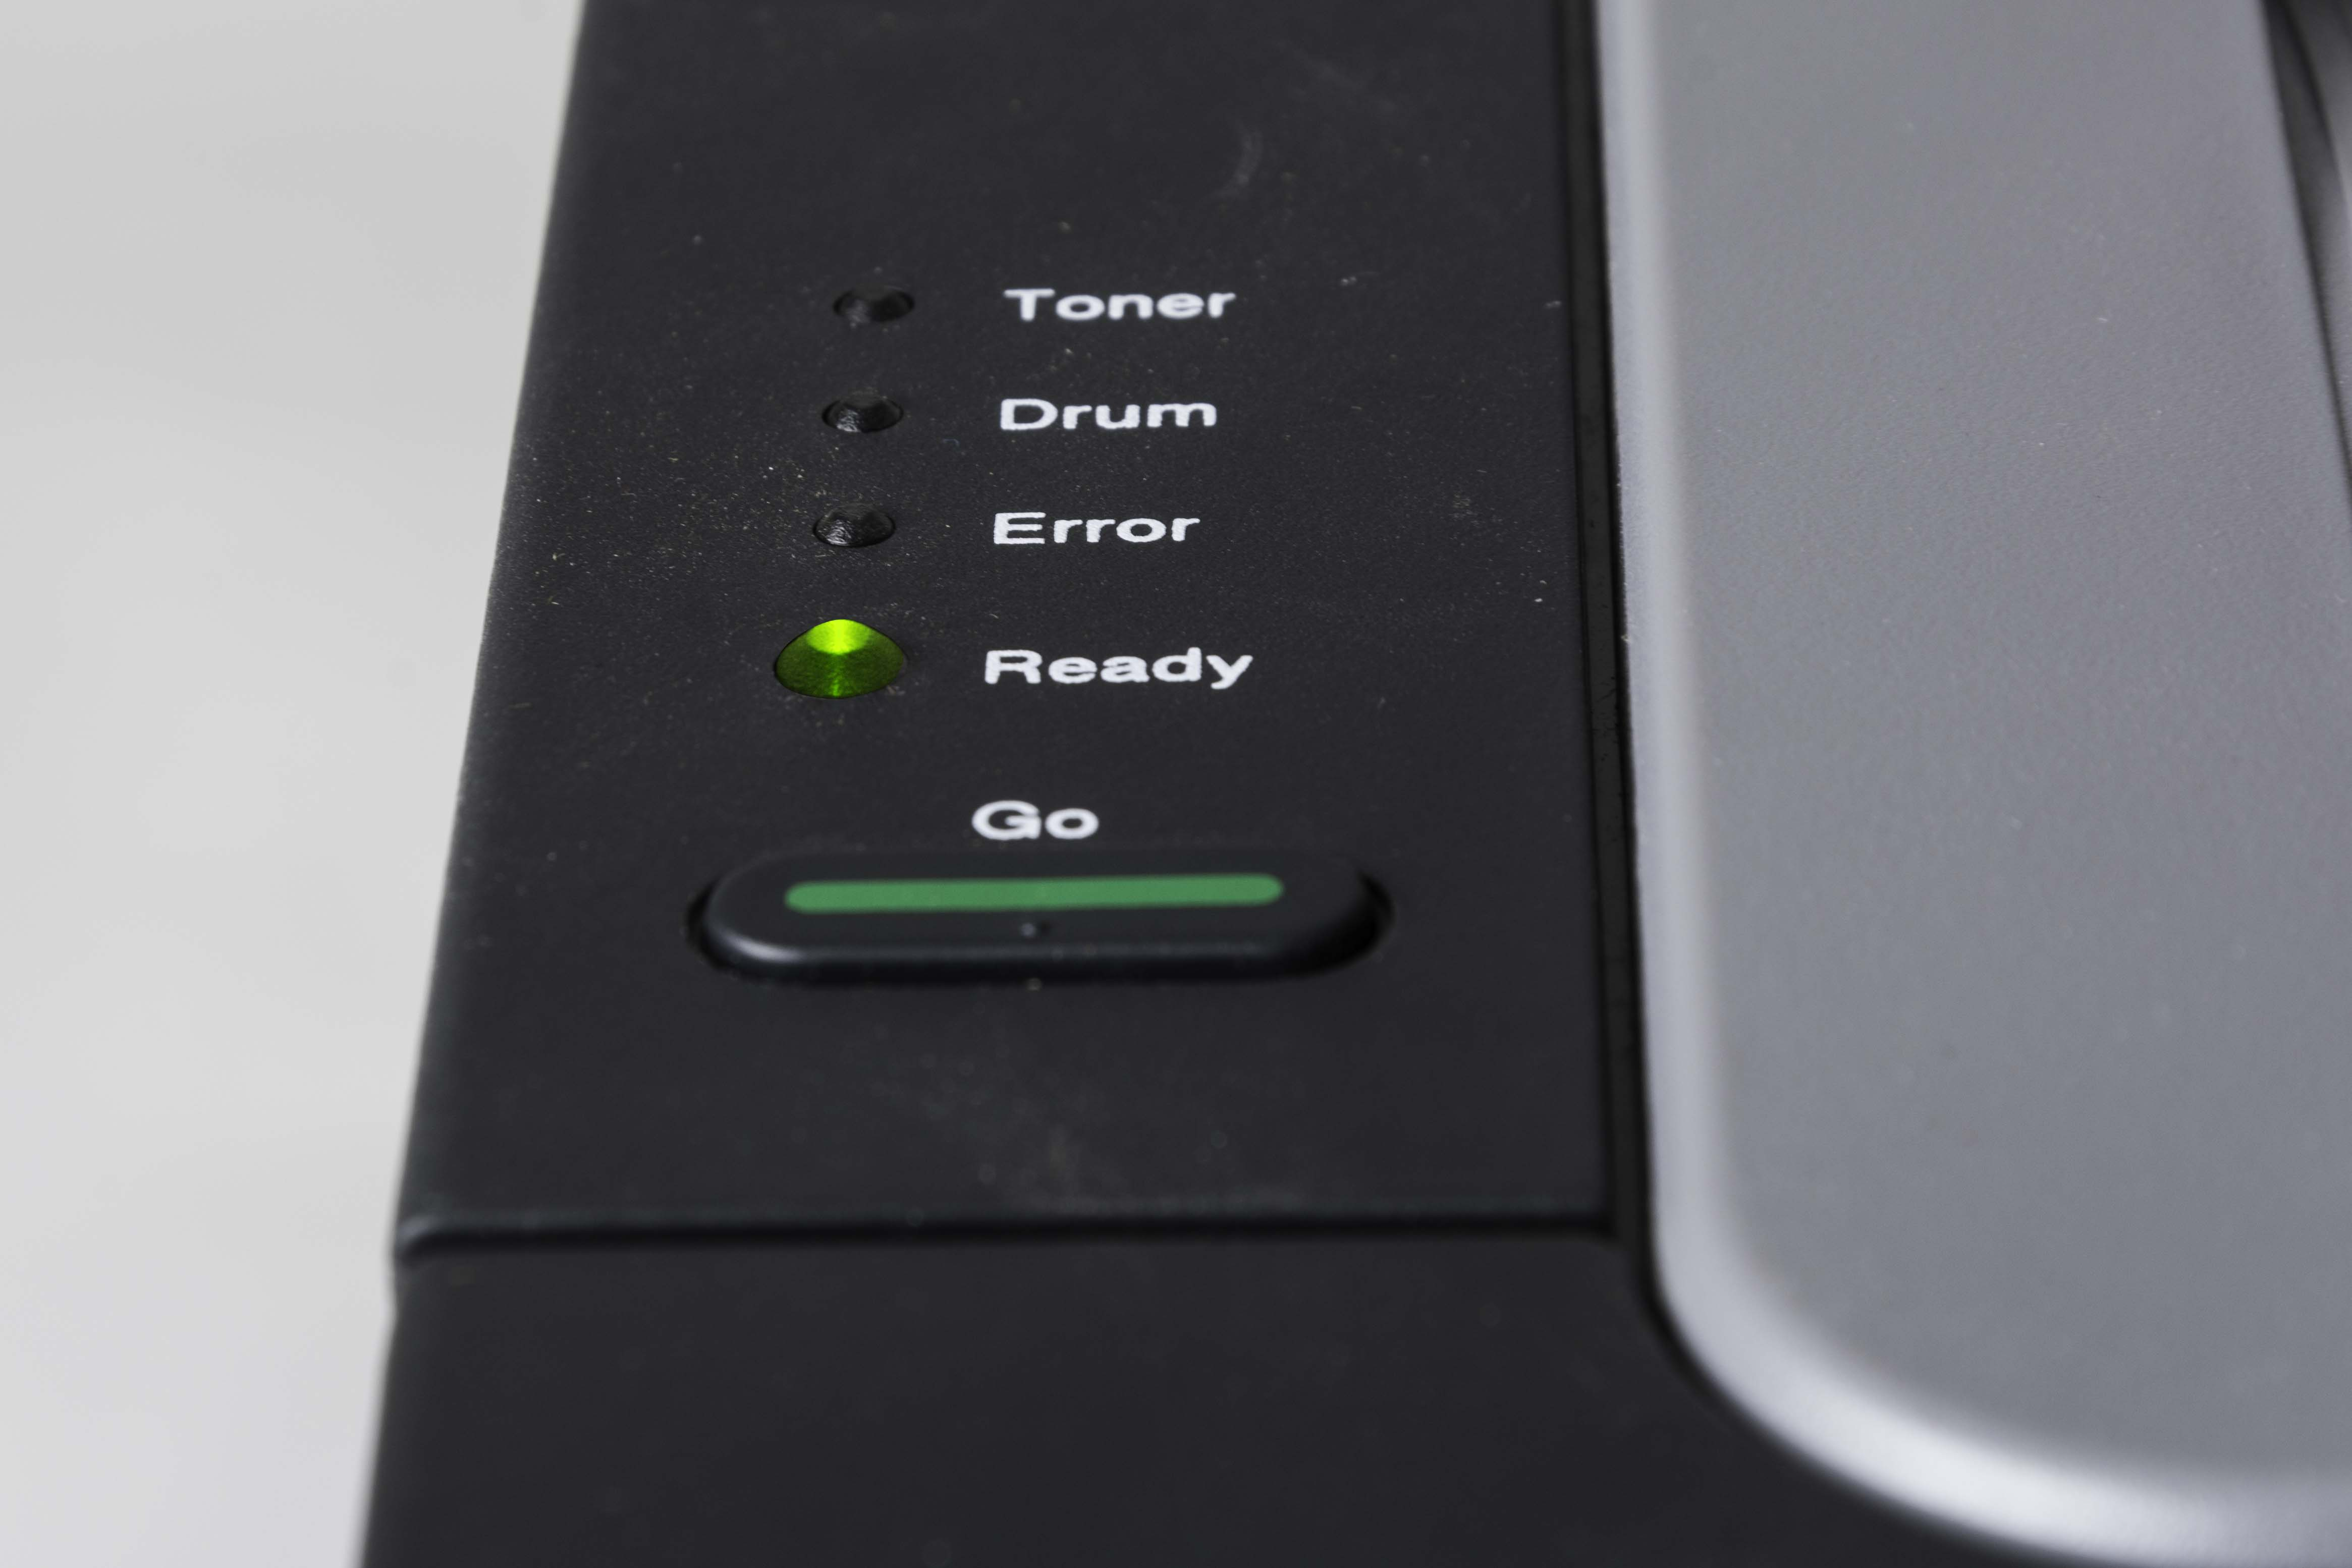 Brother HL-2240 printer control panel